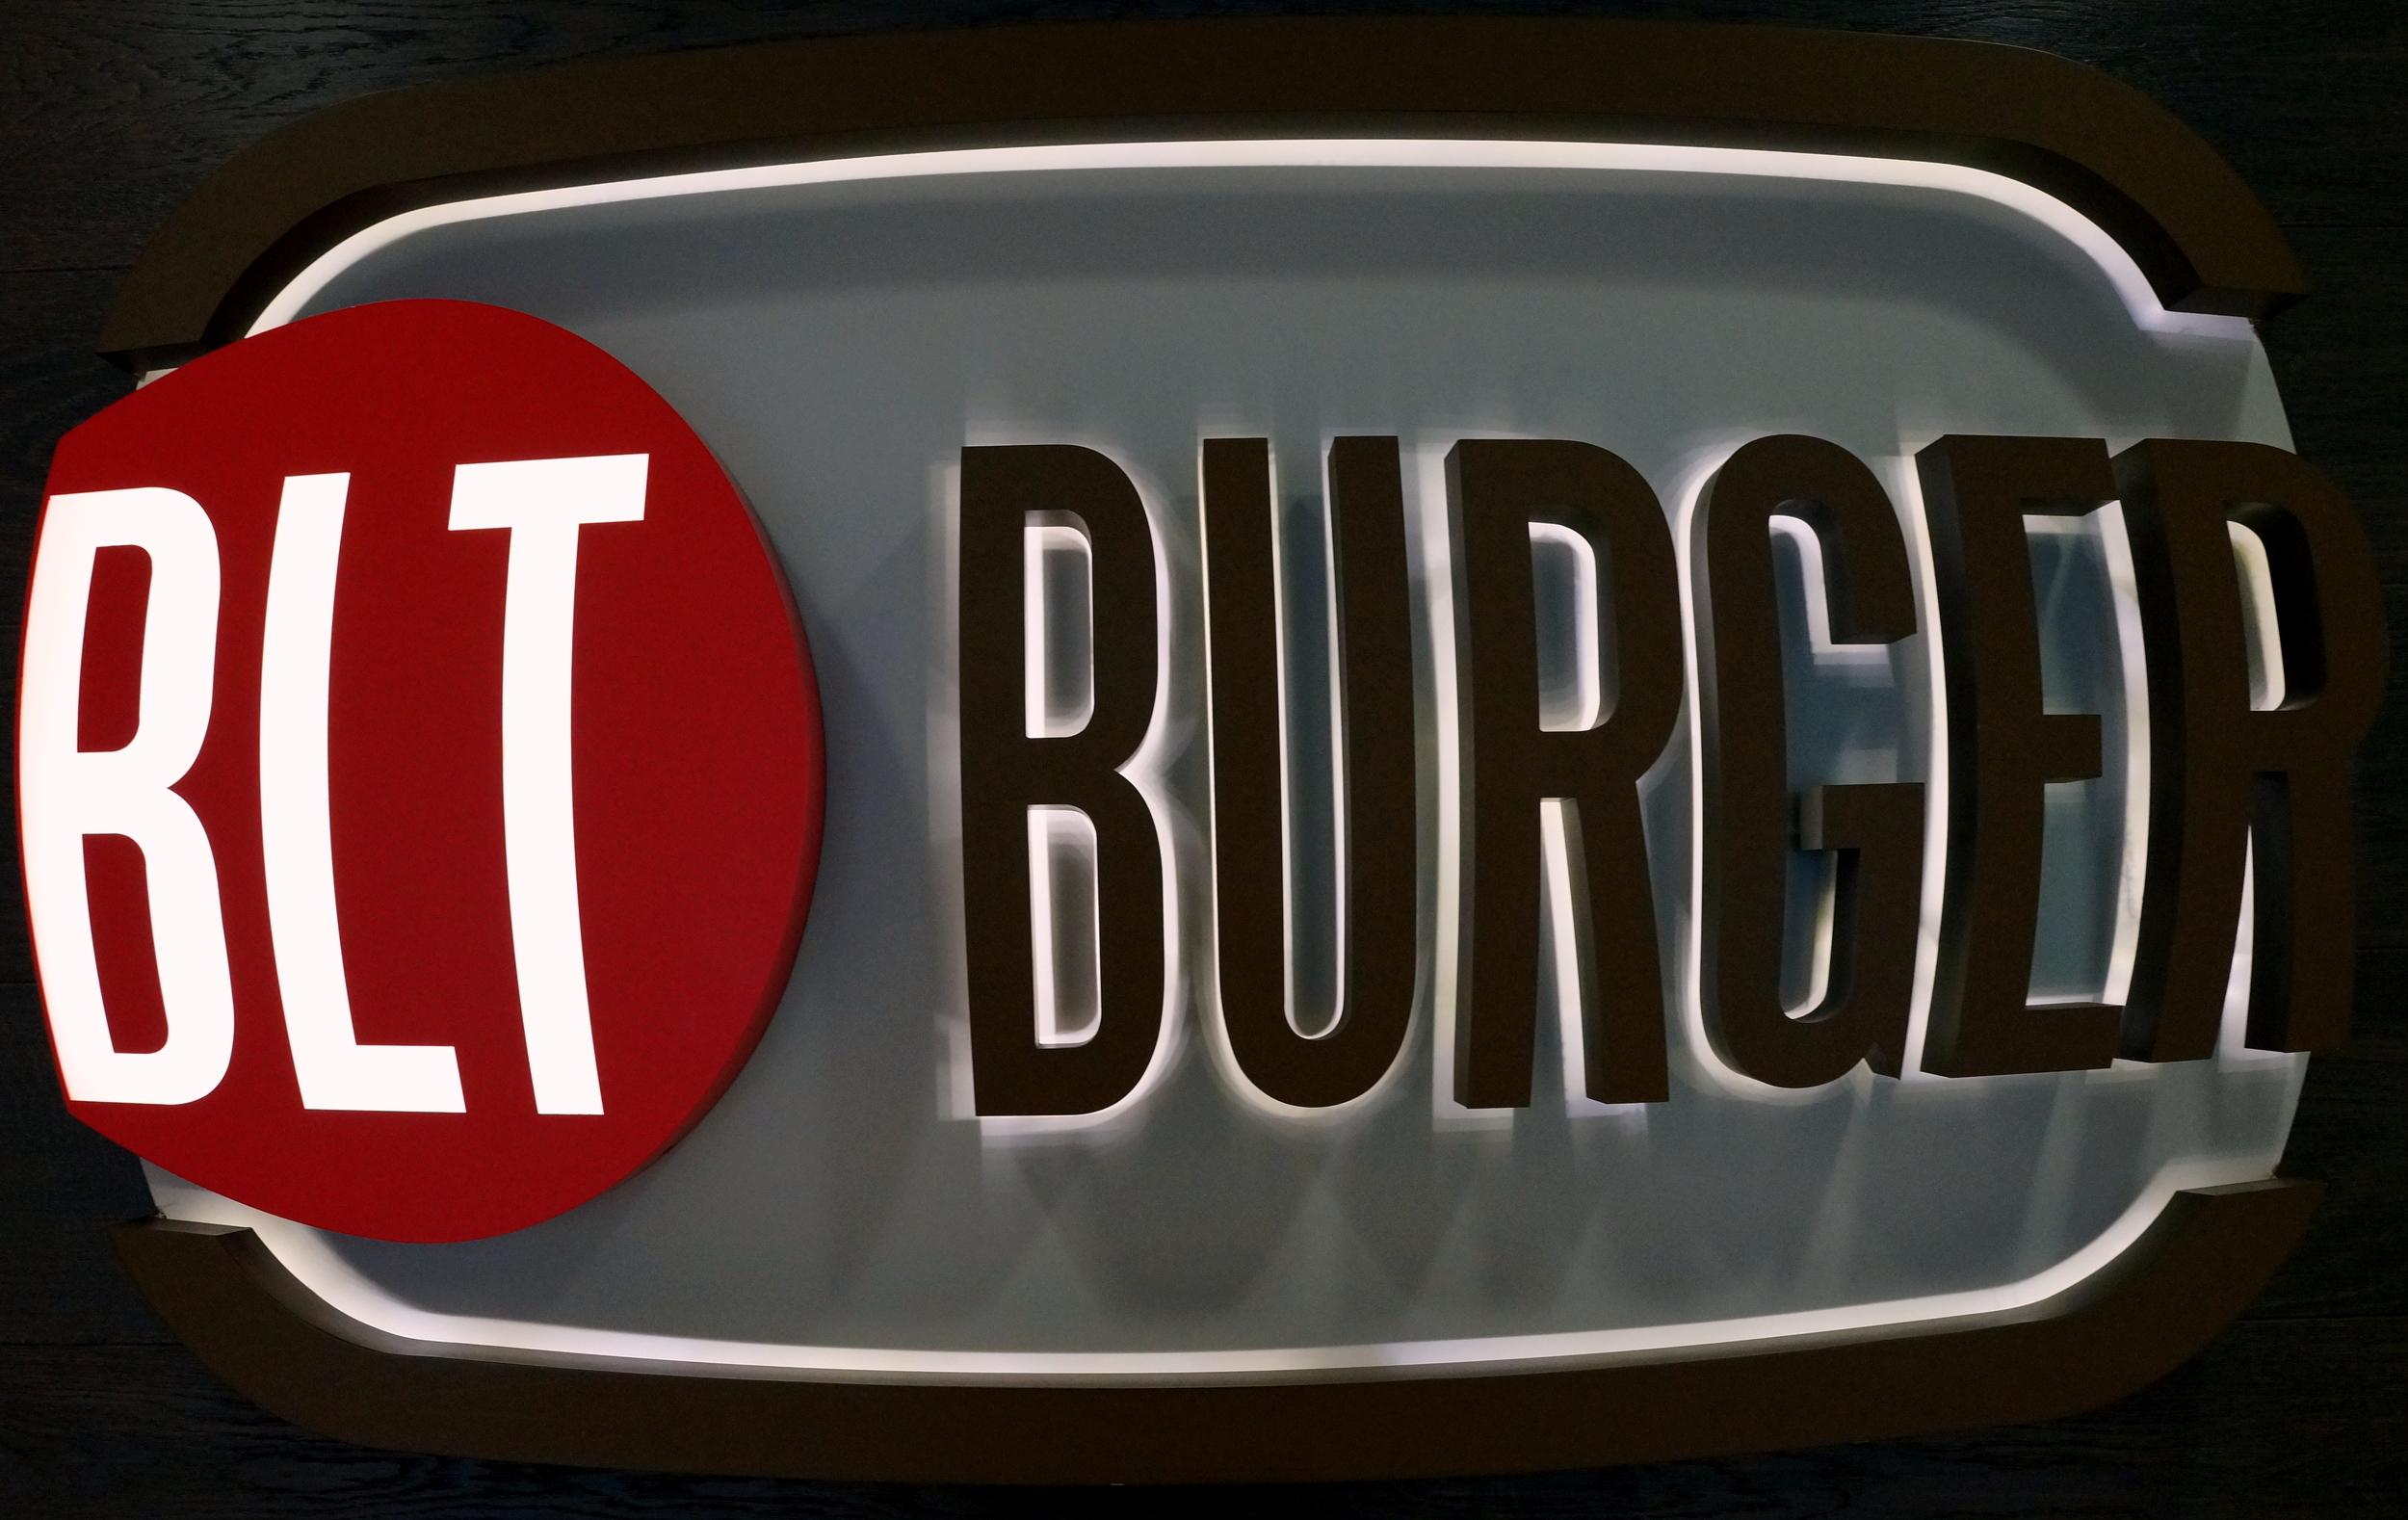 ....they make a darn good burger - Ocean Terminal, TST in Kowloon BLT Burger